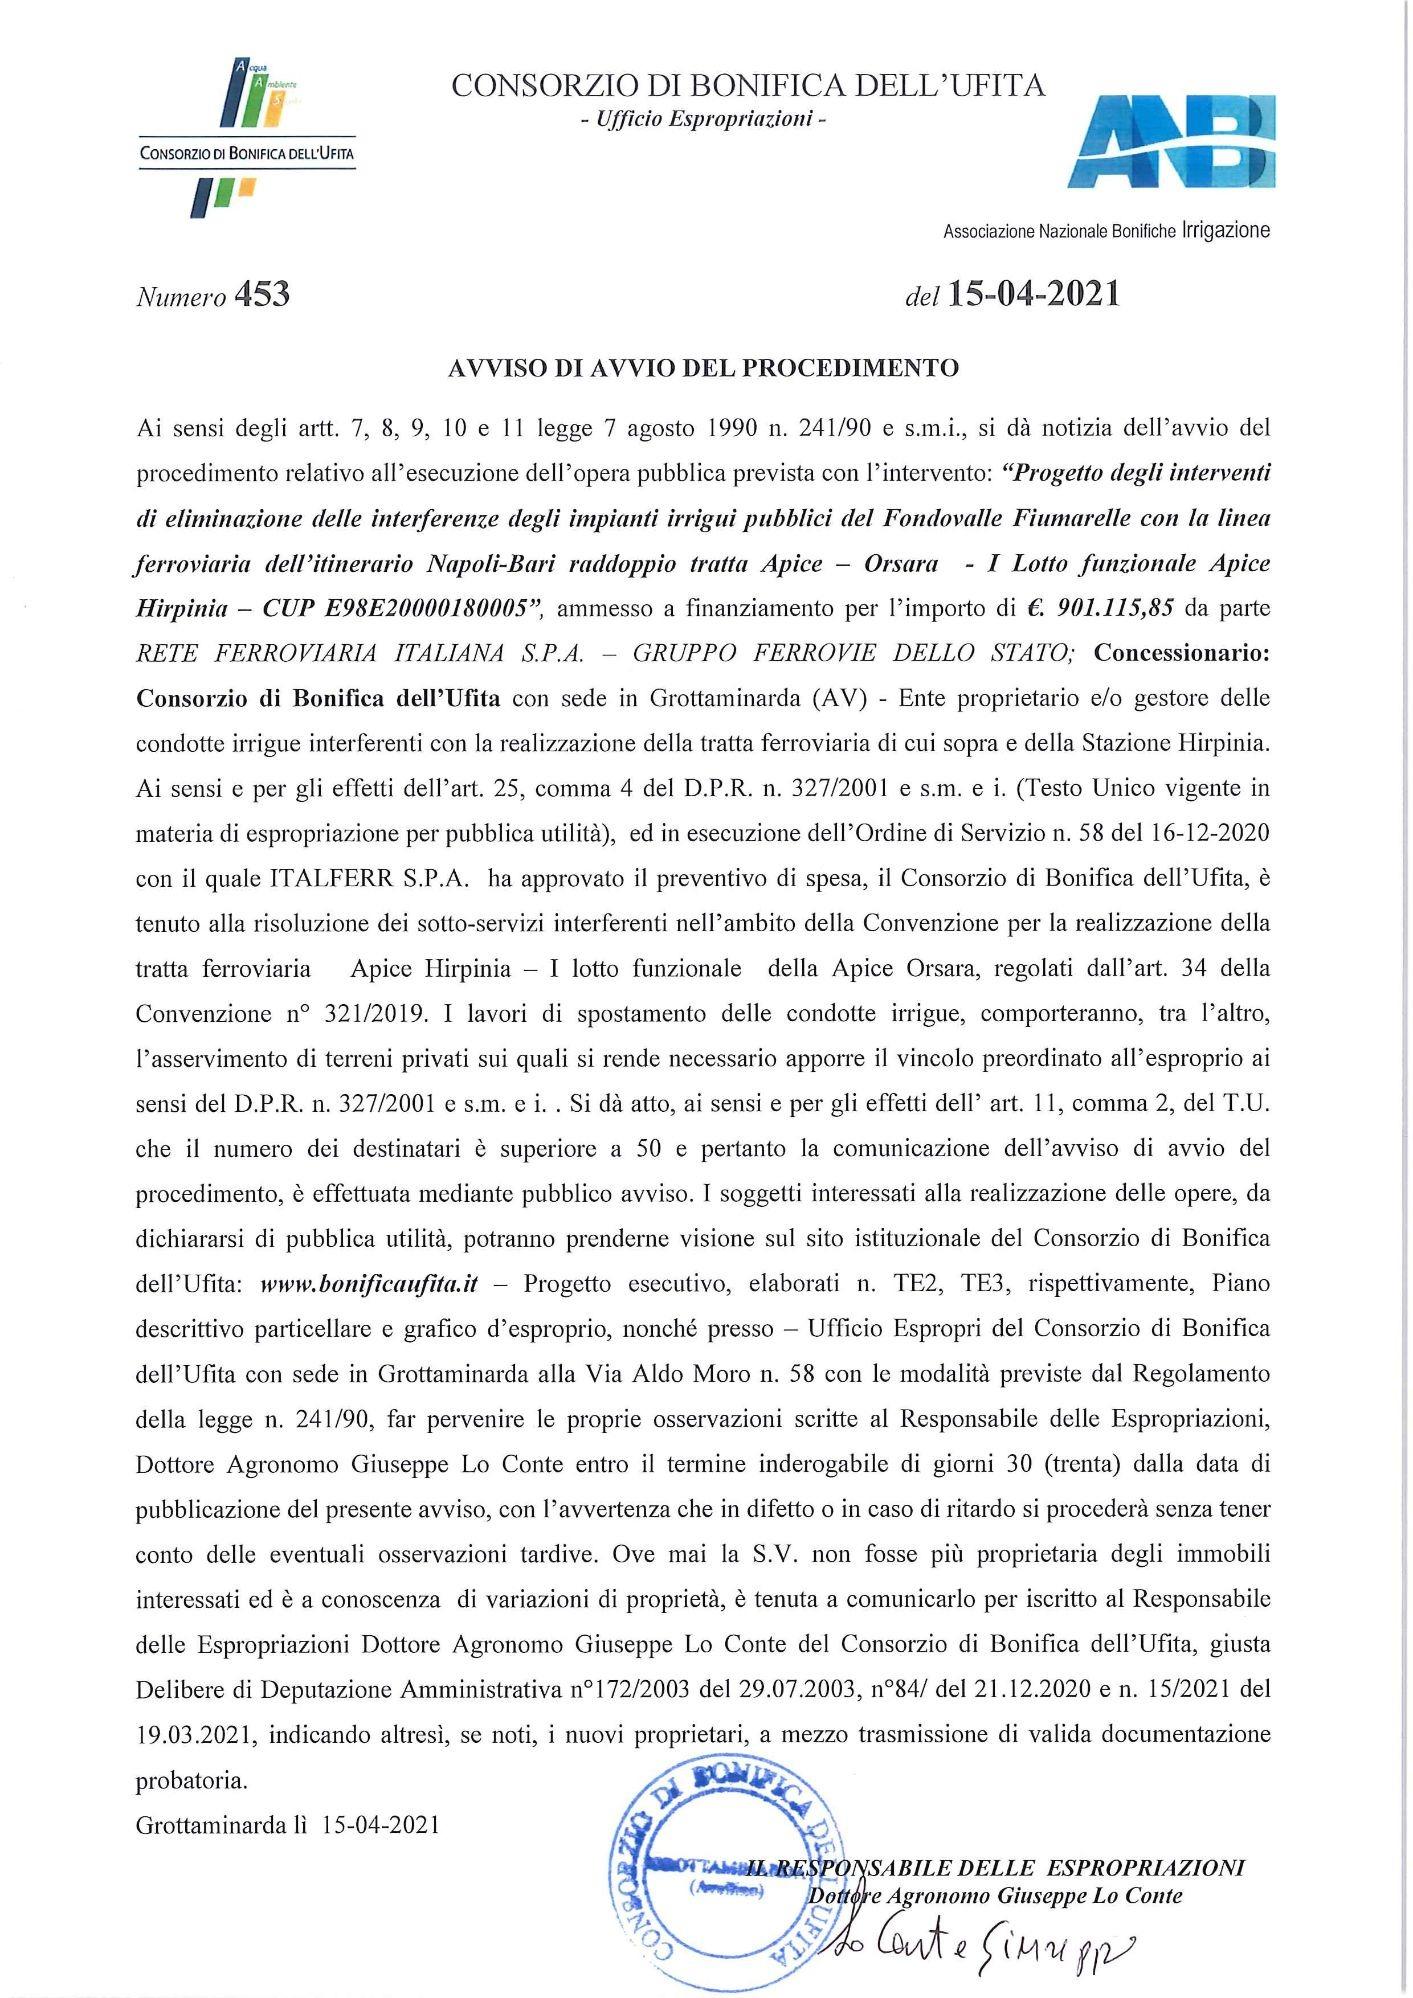 Avviso Avvio vincolo espropri ITALFERR